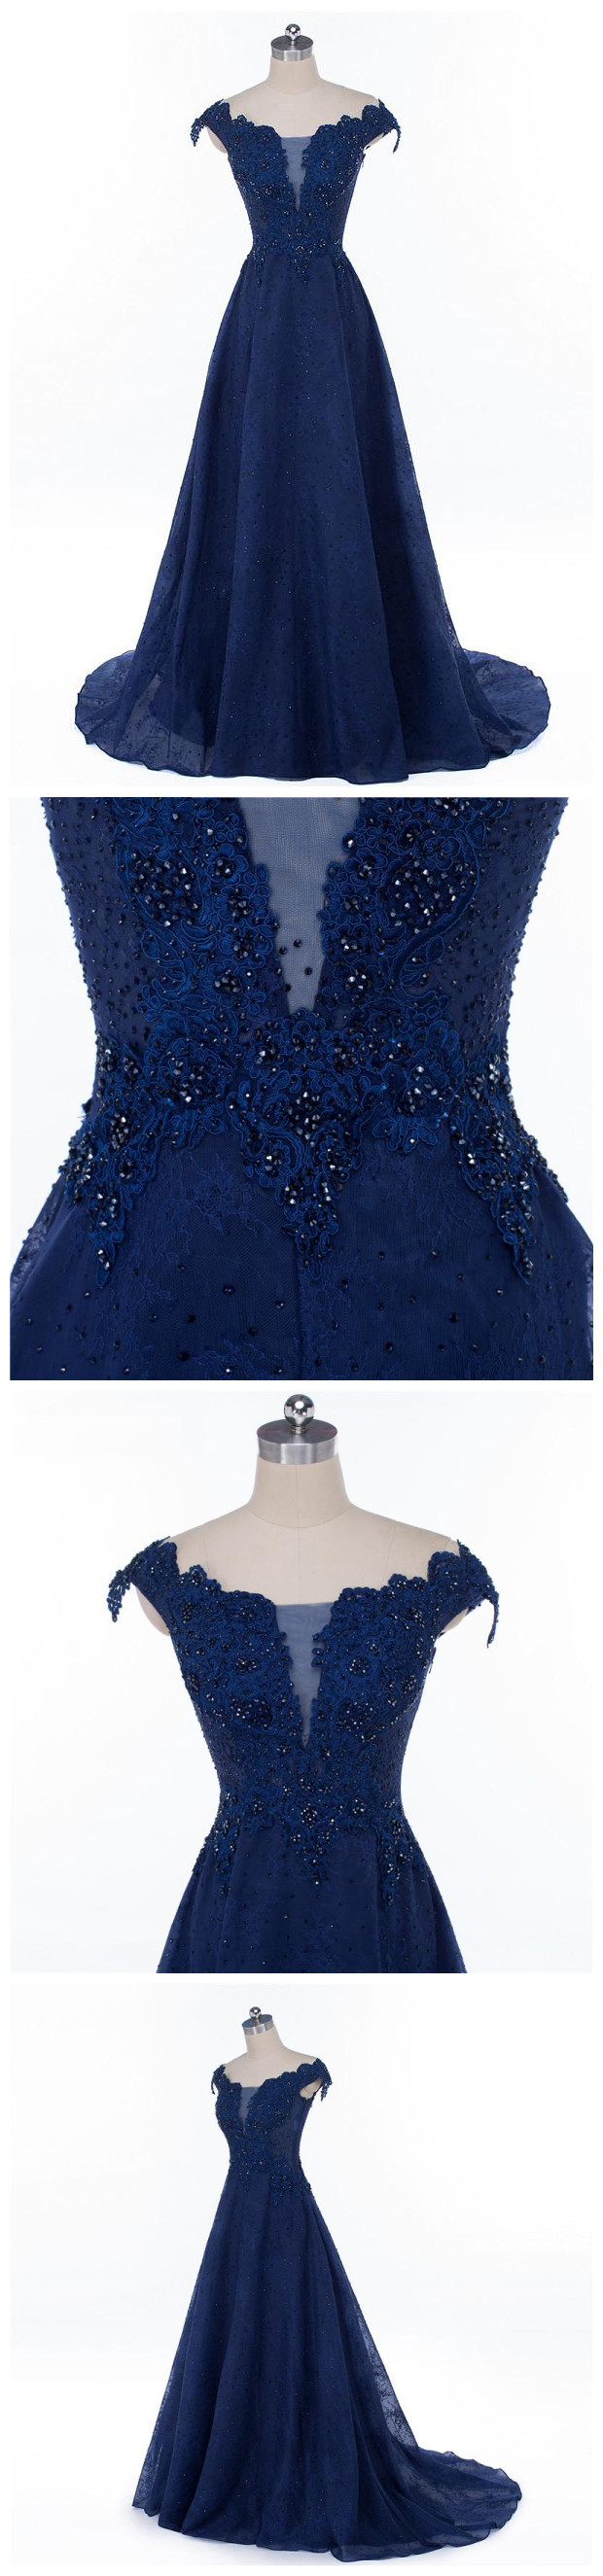 Chic dark navy prom dress aline applique off shoulder long prom